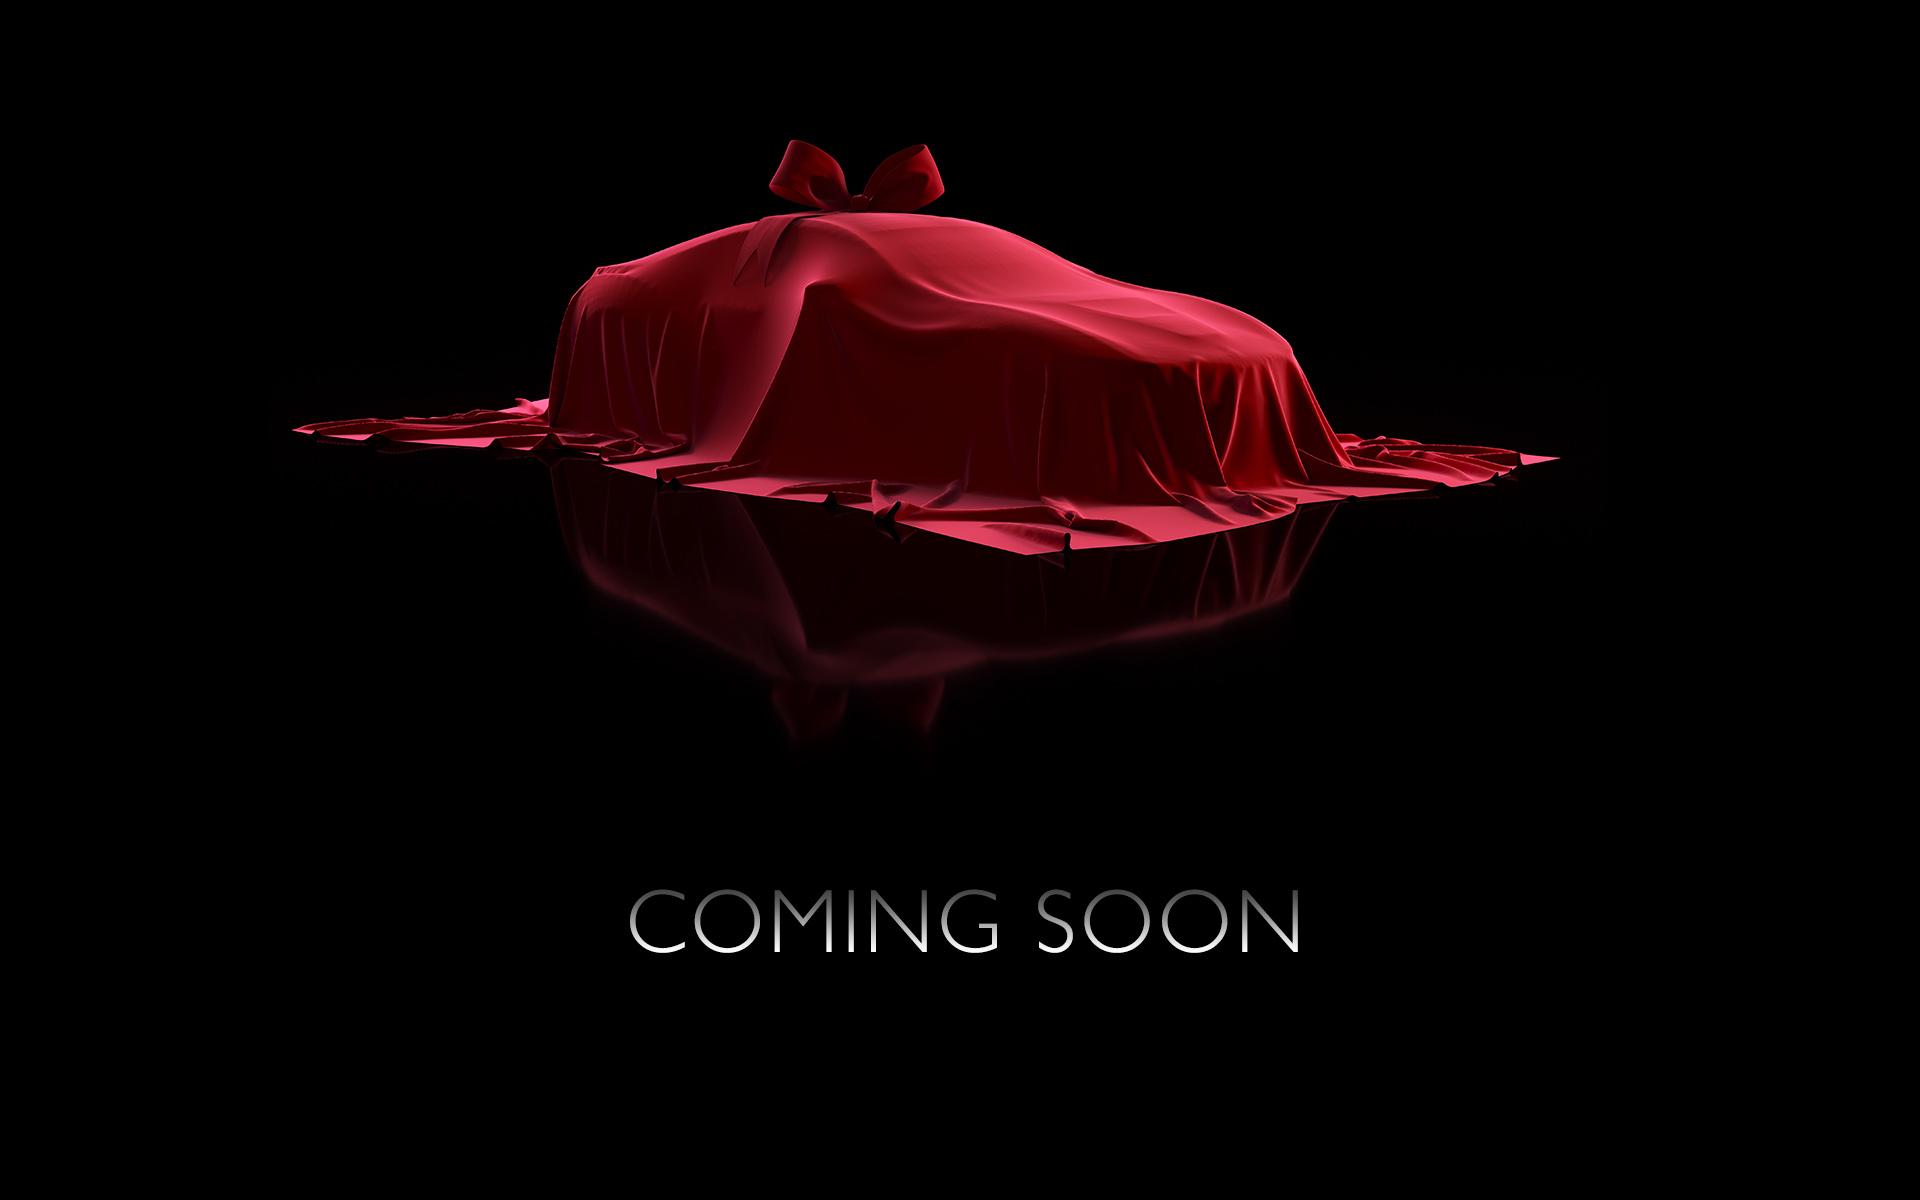 2015 Land Rover Range Rover Autobiography LWB Black Edition